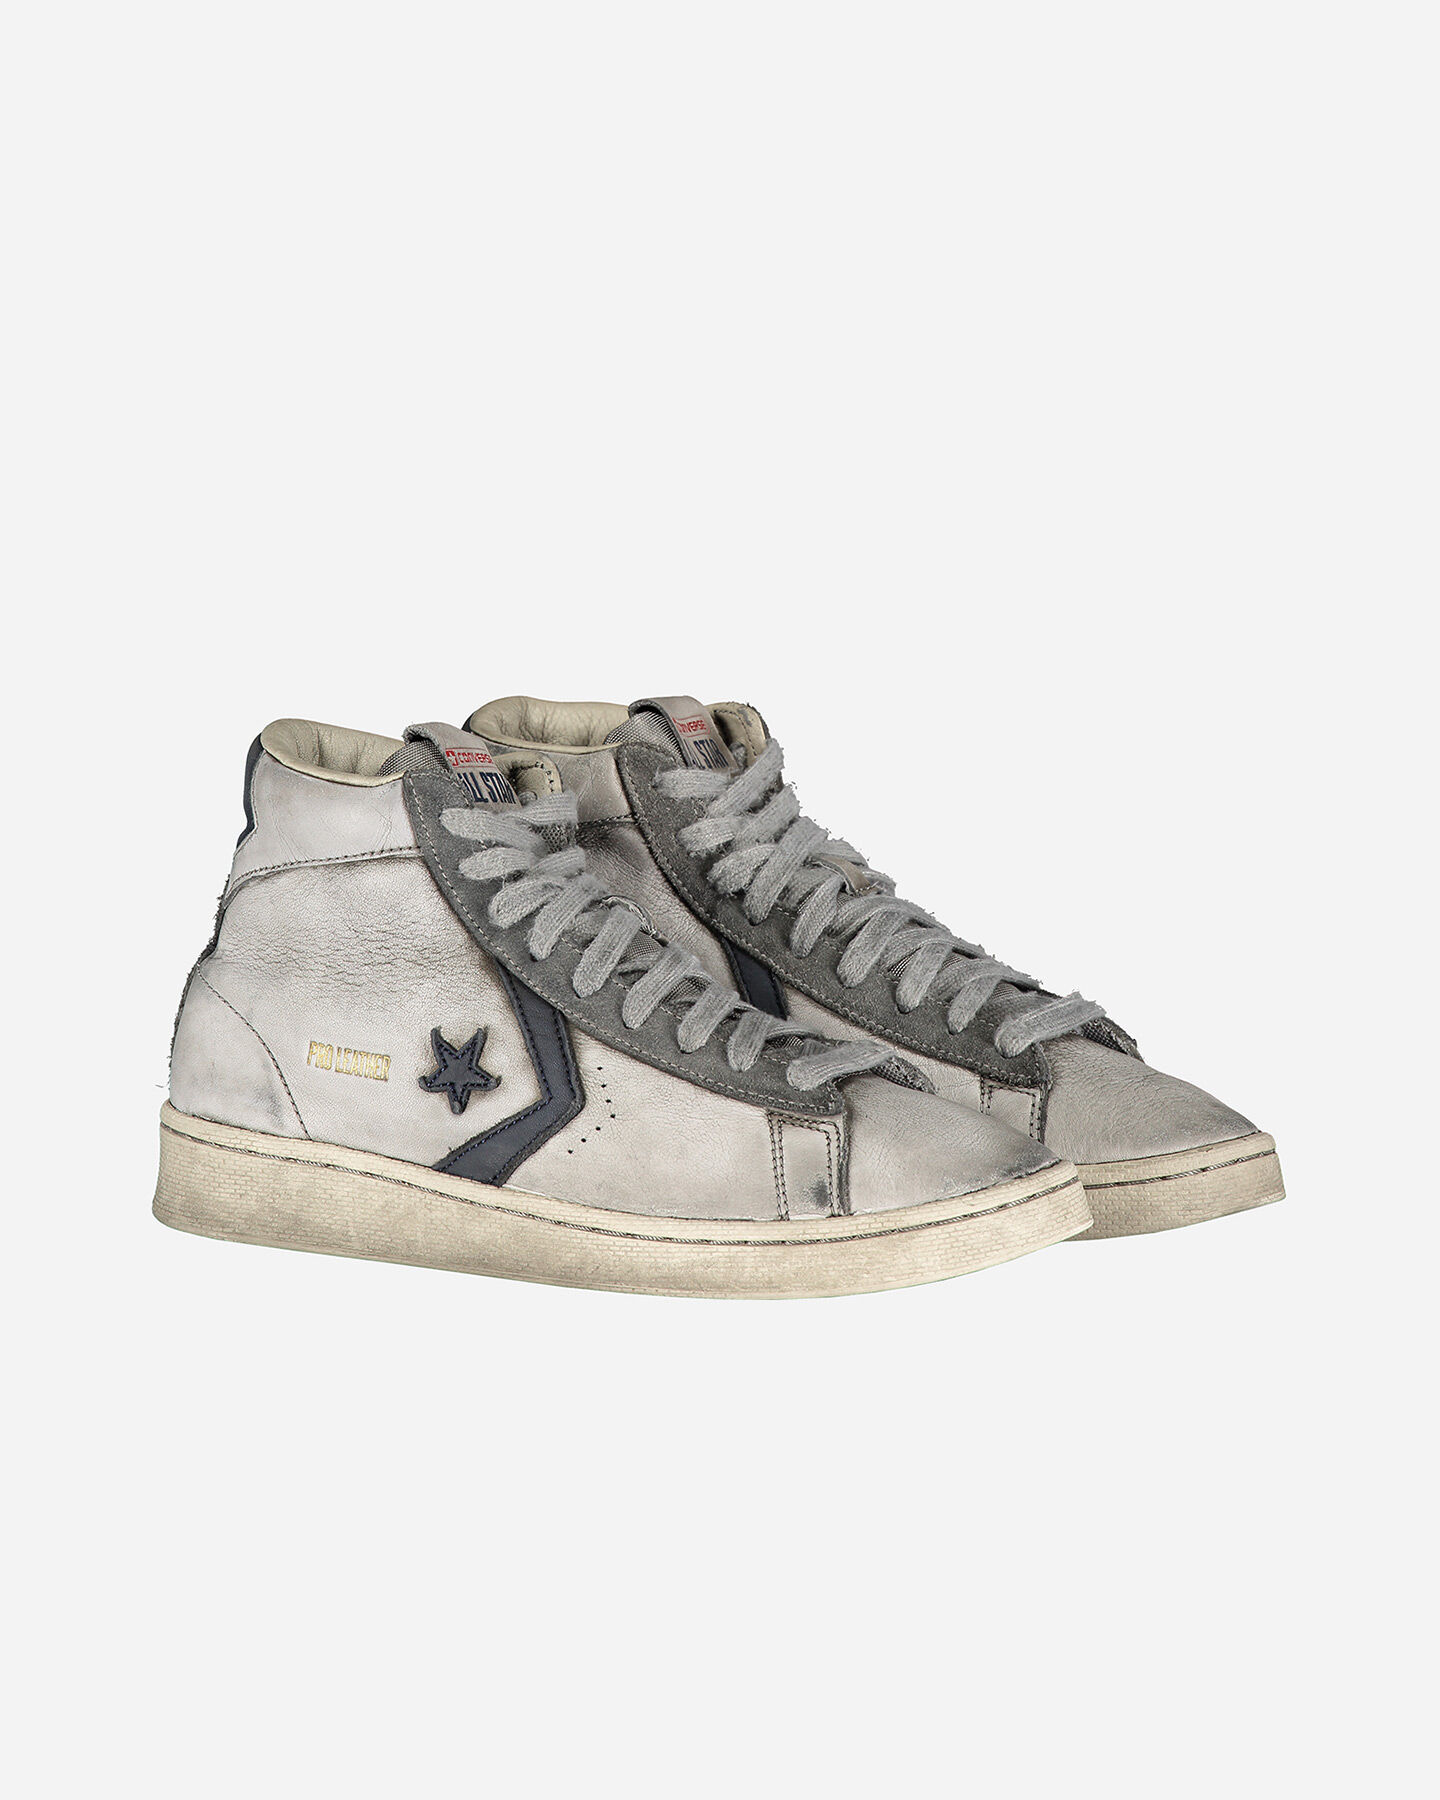 Scarpe sneakers CONVERSE SMOKE IN PRO LEATHER MID M S5238002 scatto 1